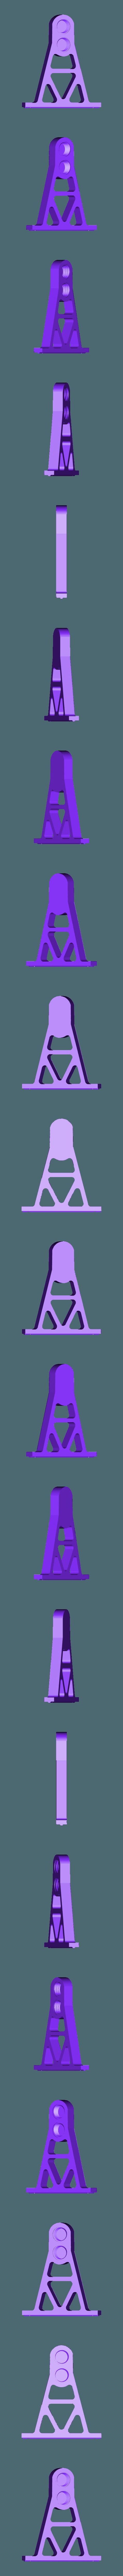 Spool_Ex_Rear_Holes.stl Download free STL file Extended Overhead Filament Spool Holder (Lulzbot TAZ) • 3D printable object, Roger